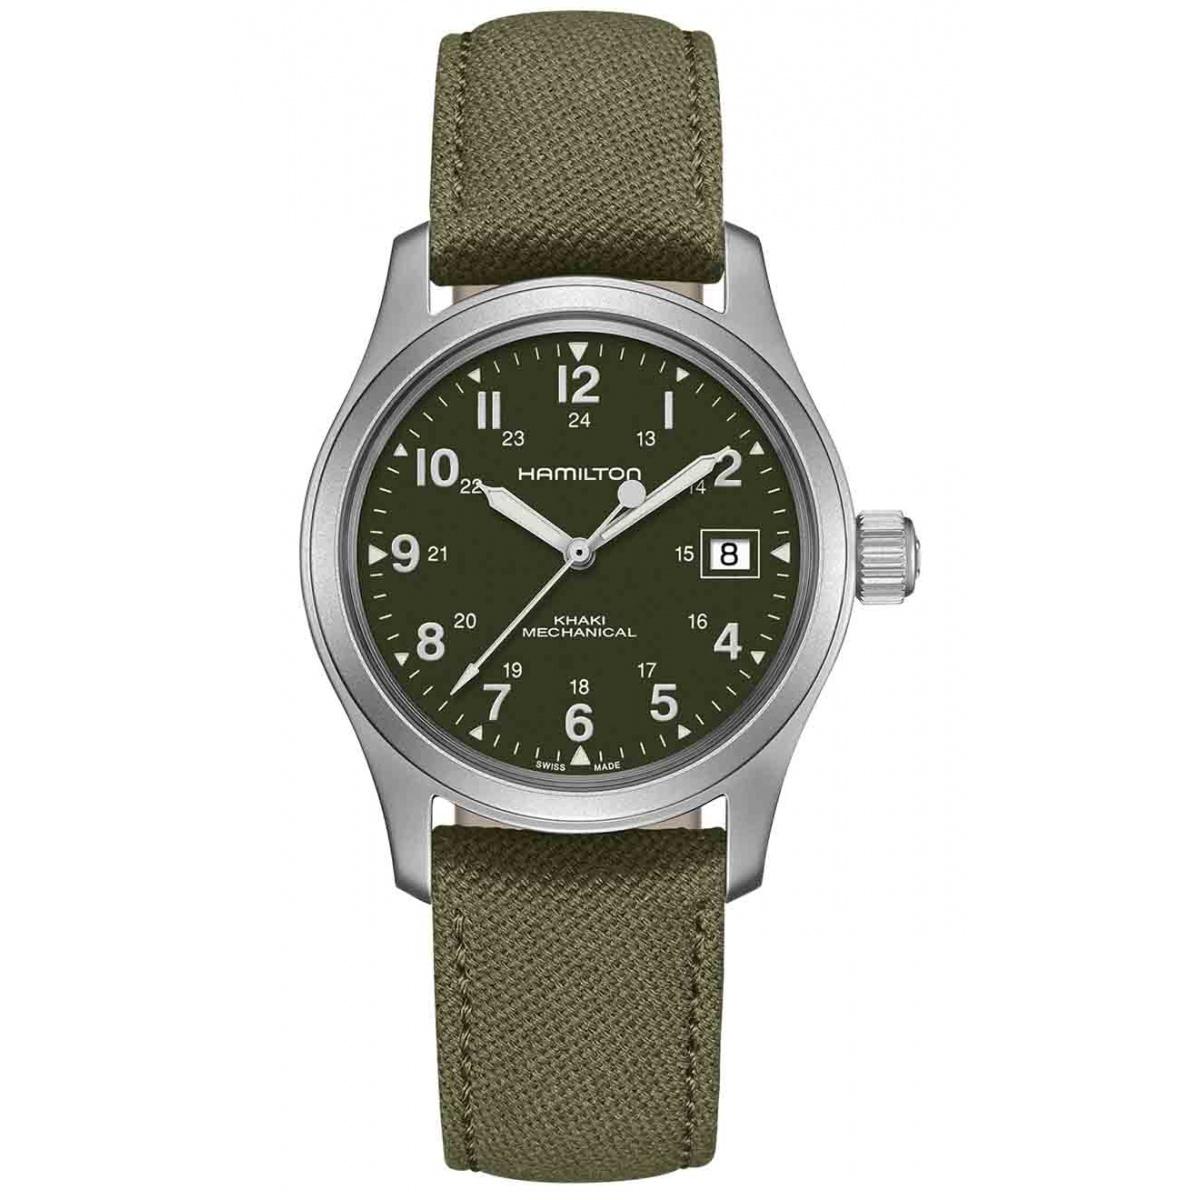 Hamilton Khaki Field Officer Handwinding - 50 M - ∅38 mm, Esfera verde, correa verde - Calibre H-50